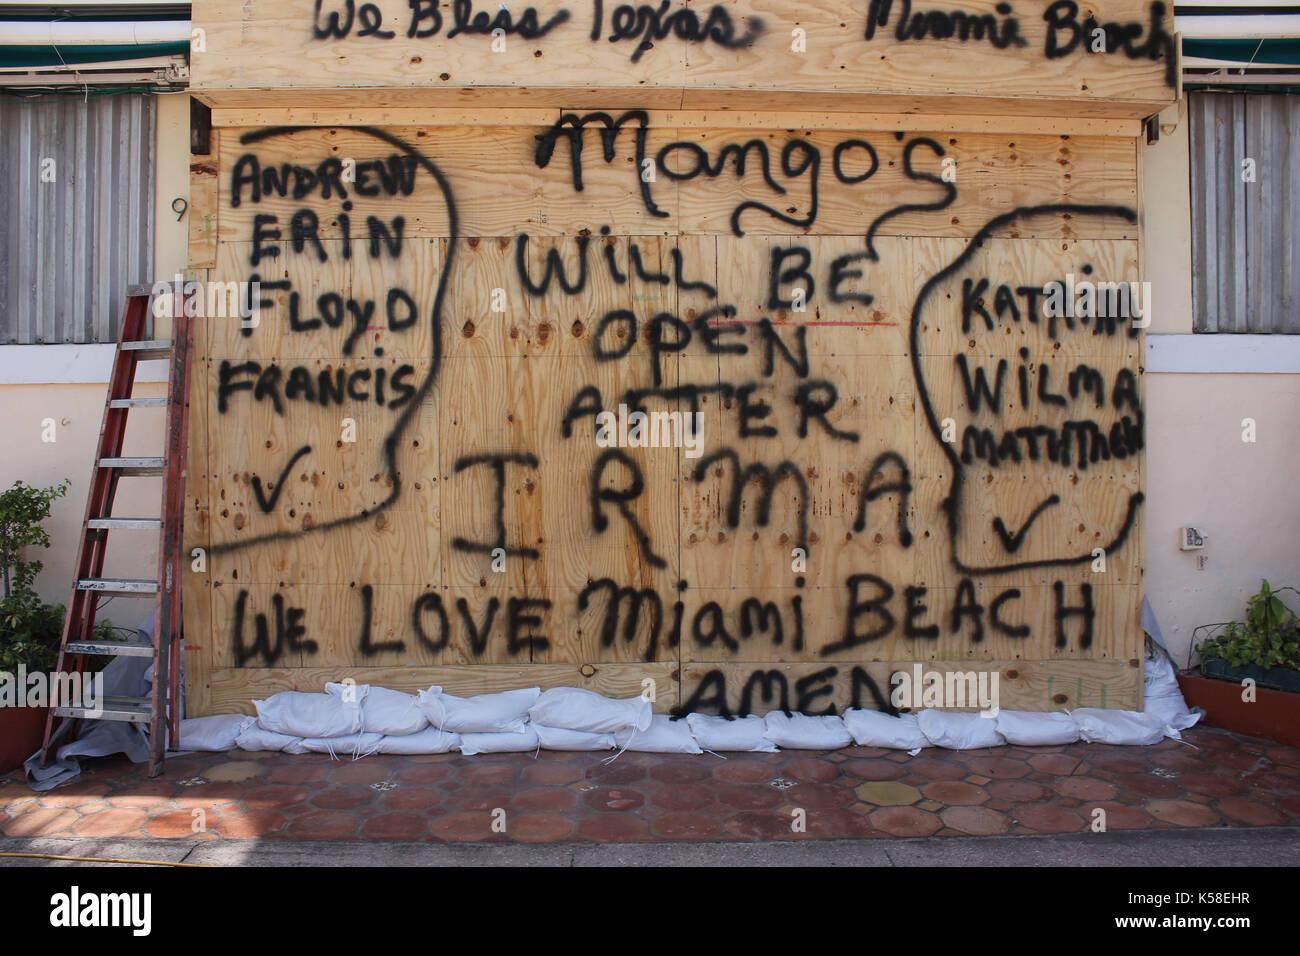 Miami Beach, Deserted, Pre Hurricane Irma, September 8, 2017 - Stock Image